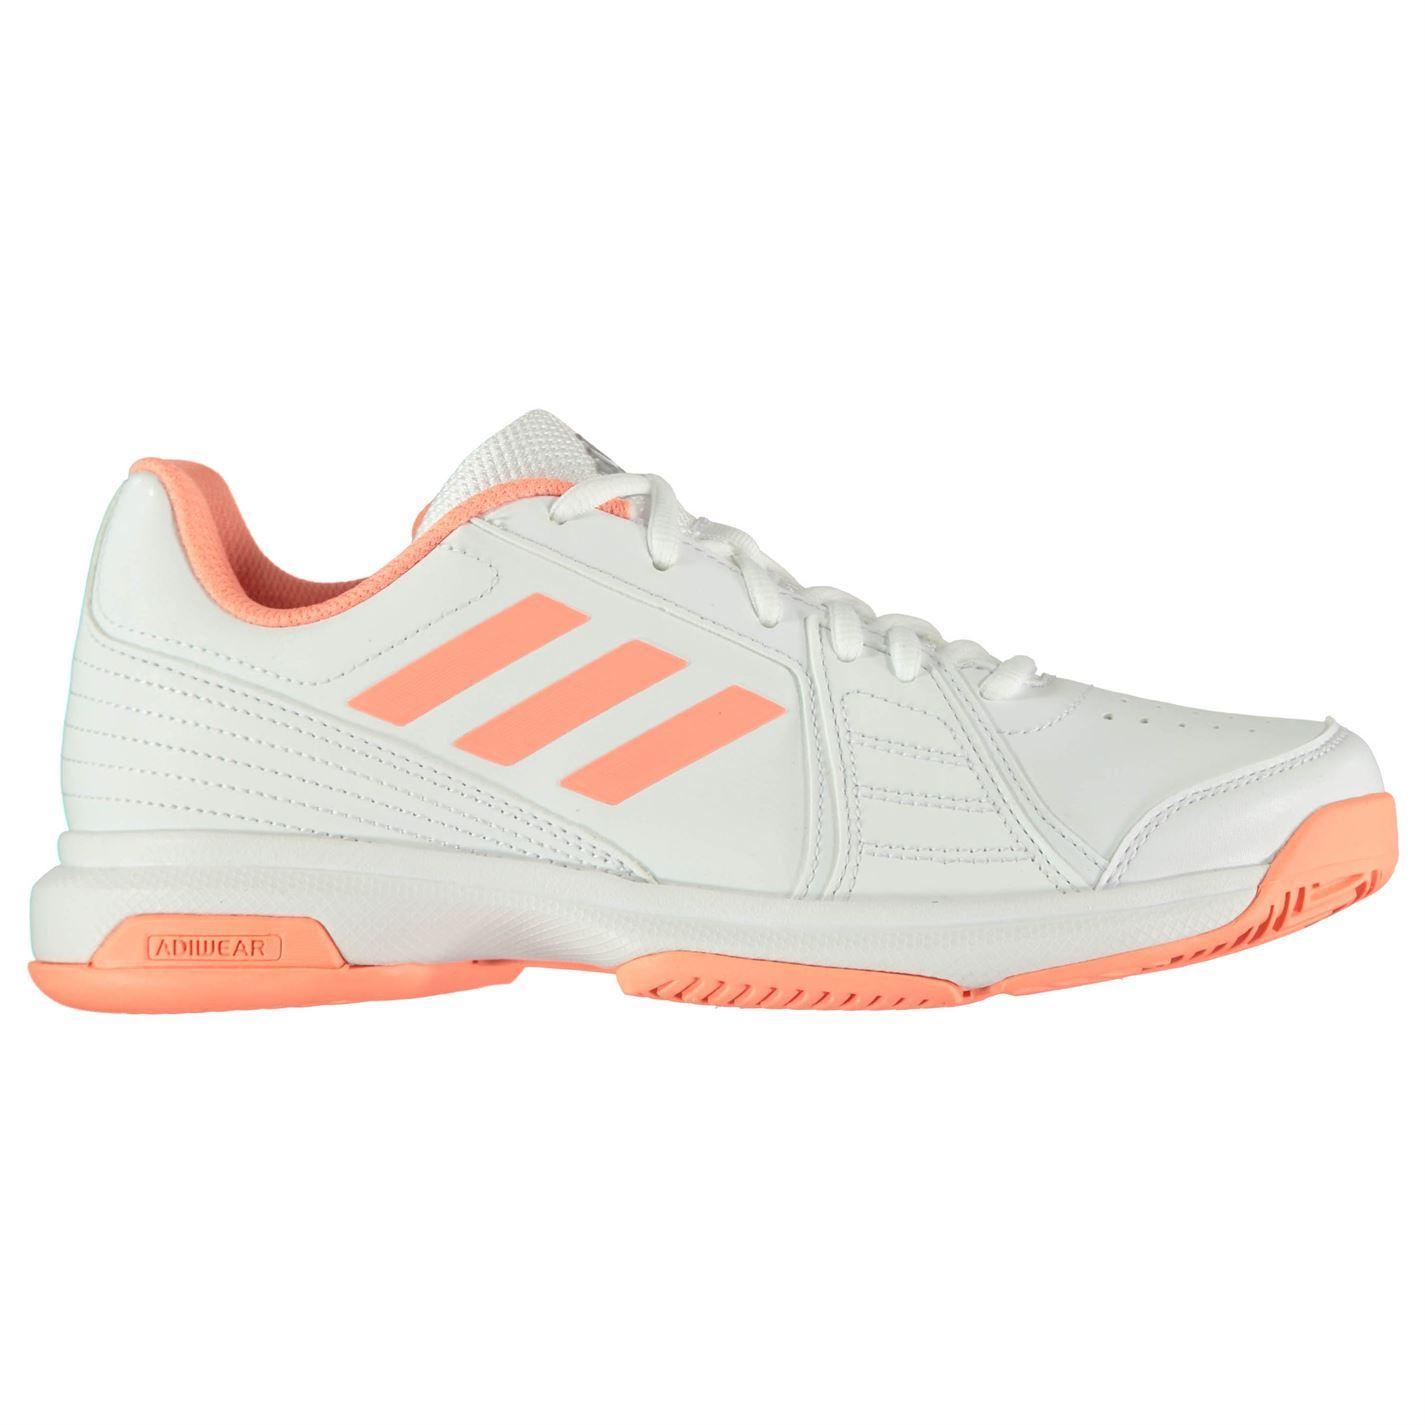 Brand Adidas Barricade Aspire Ladies Tennis Shoes White